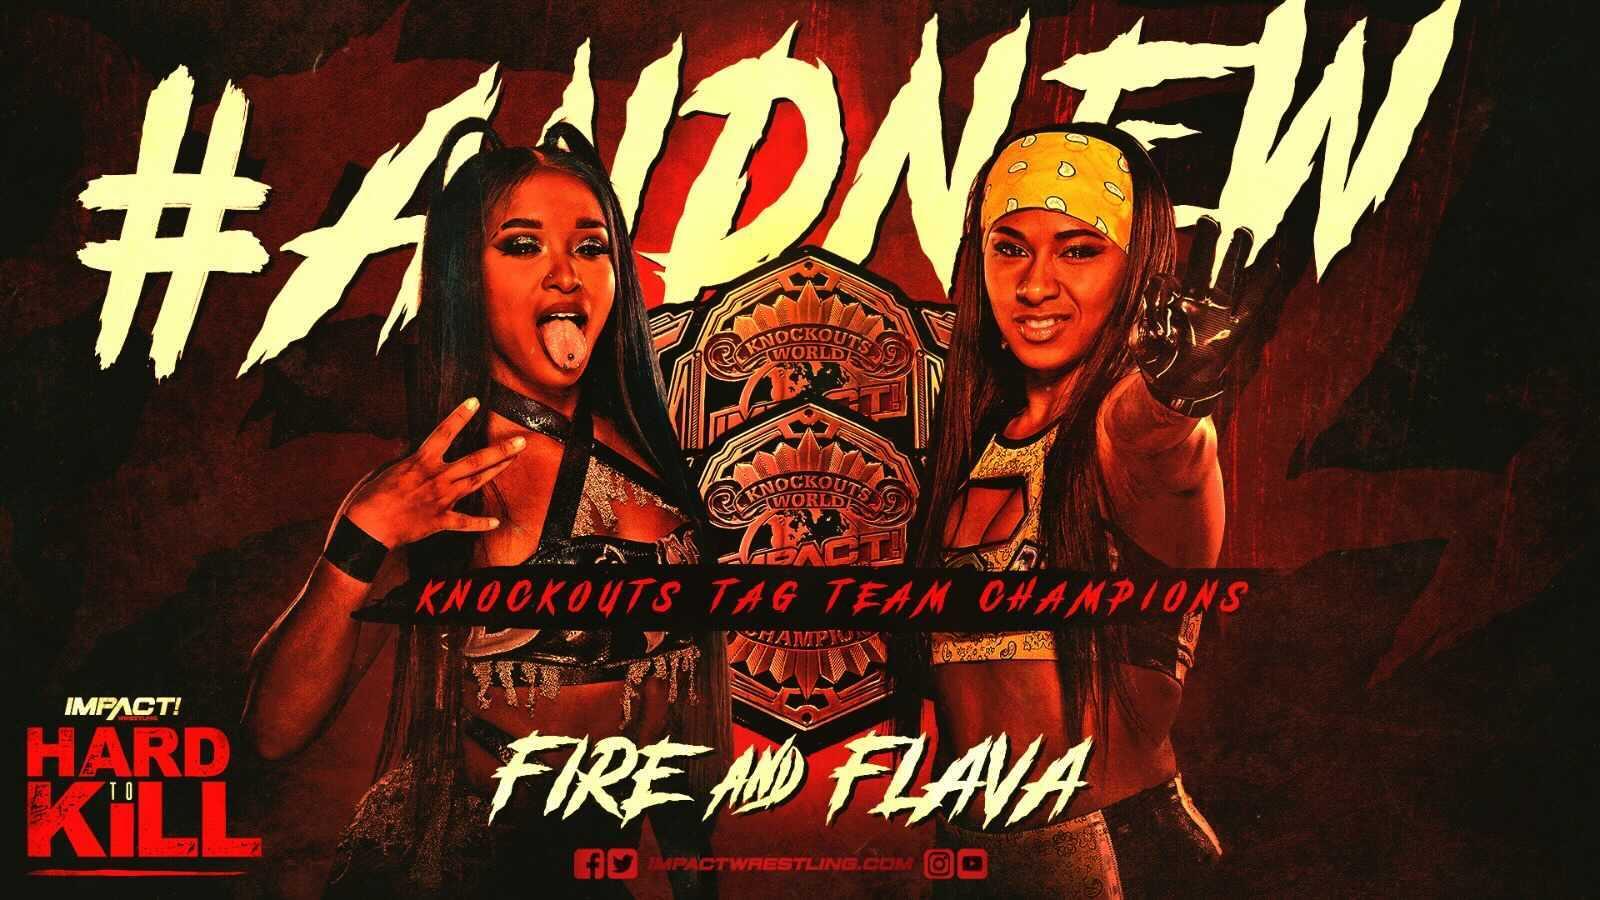 Tasha Steelz e Kiera Hogan conquistam o IMPACT Knockouts Tag Team Championship